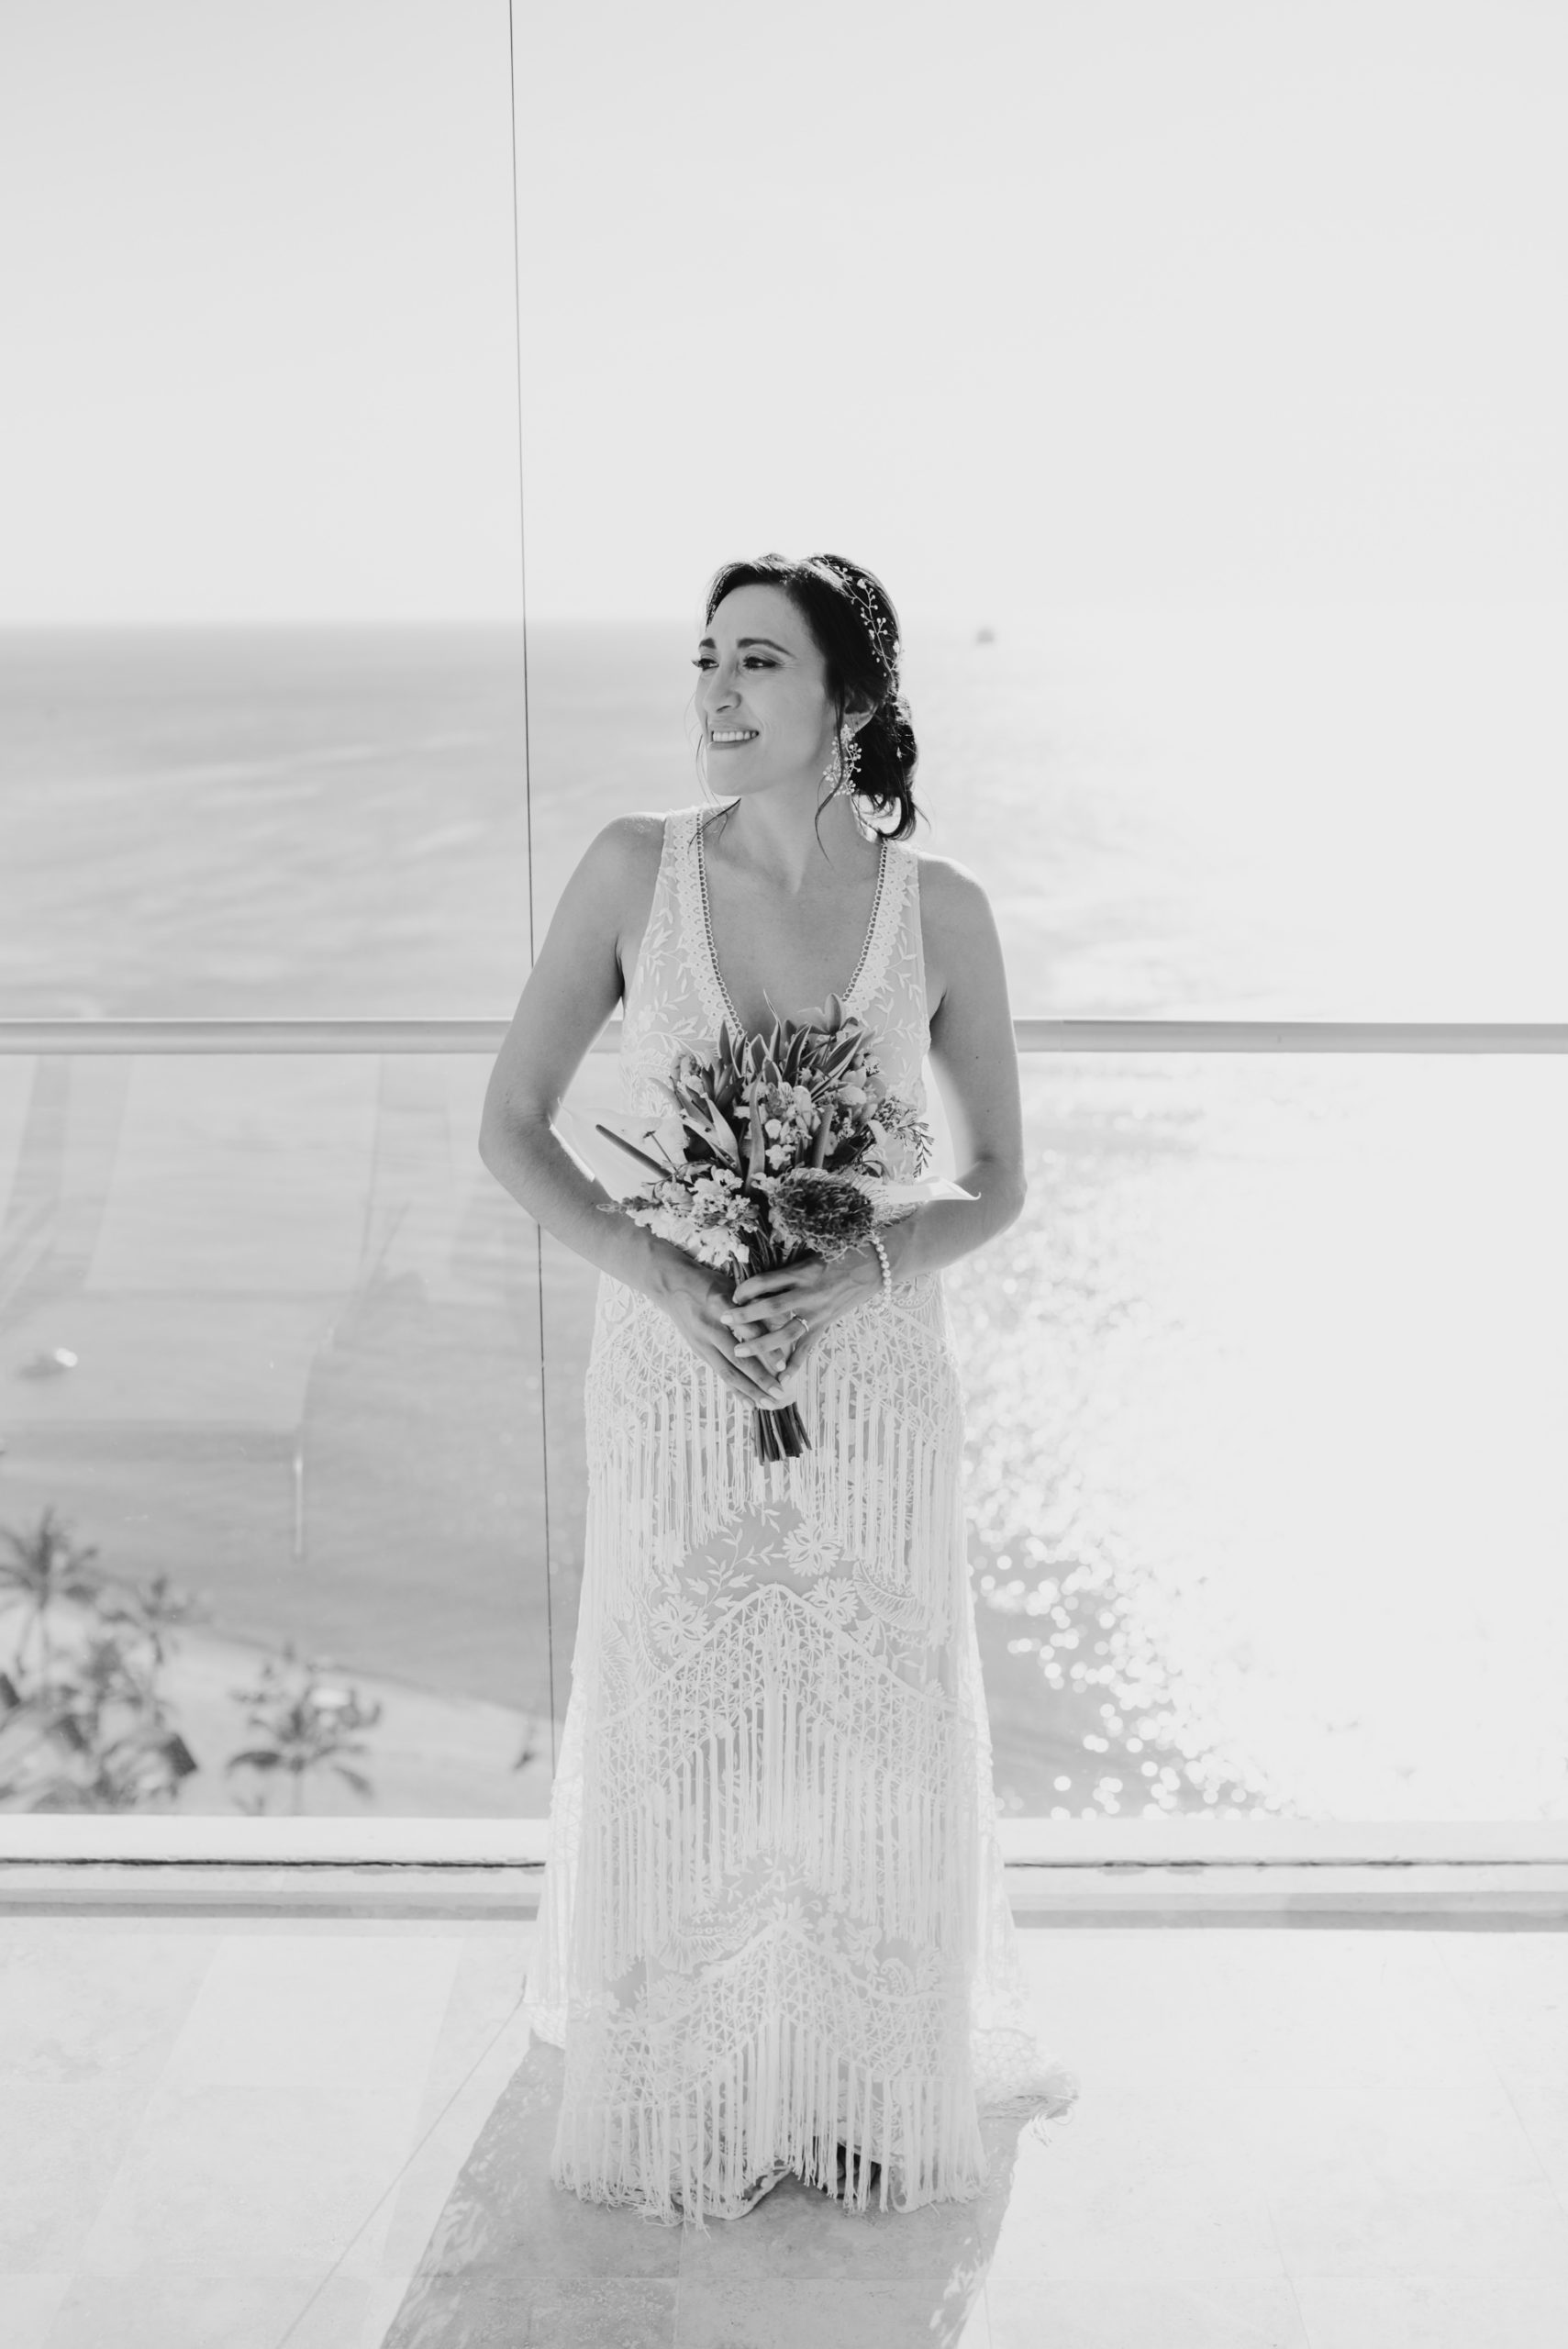 luisa nicholls wedding dress